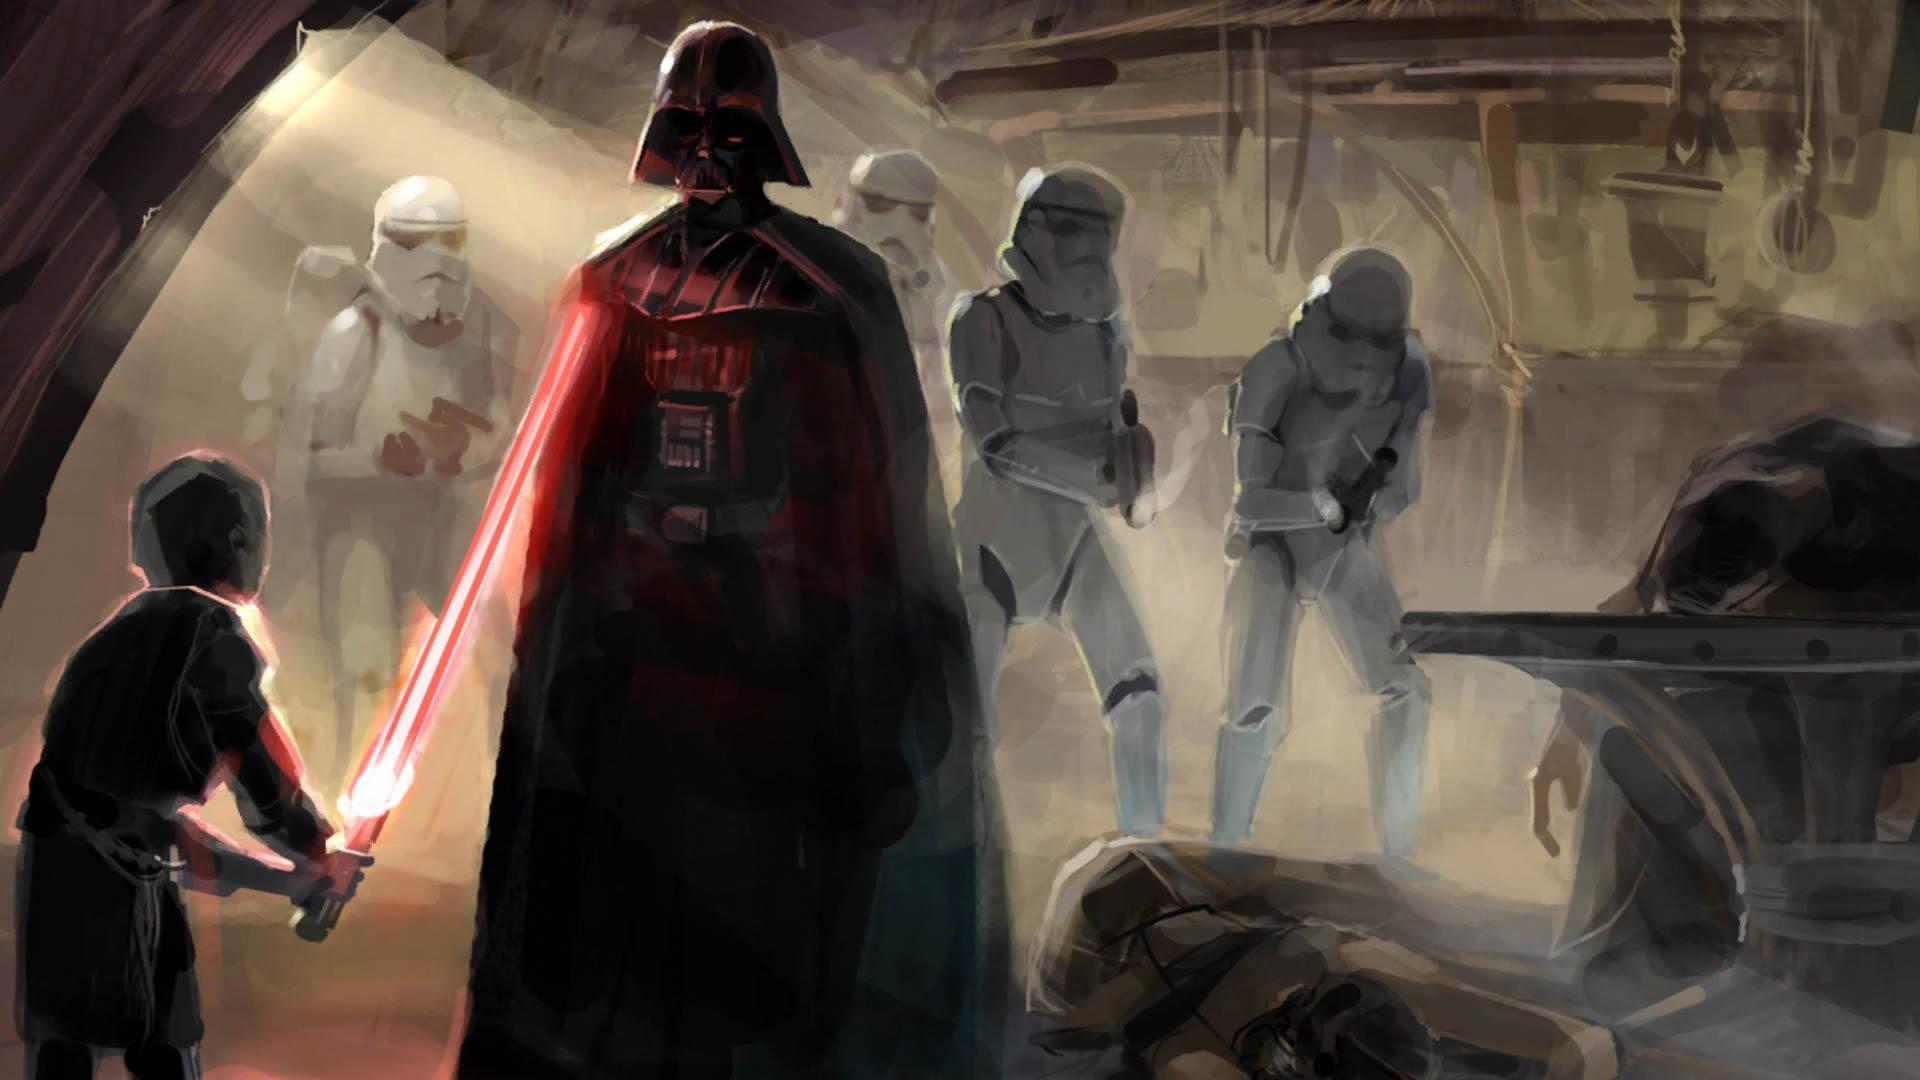 Star Wars Darth Vader Stormtrooper 1920x1080 Wallpaper Teahub Io